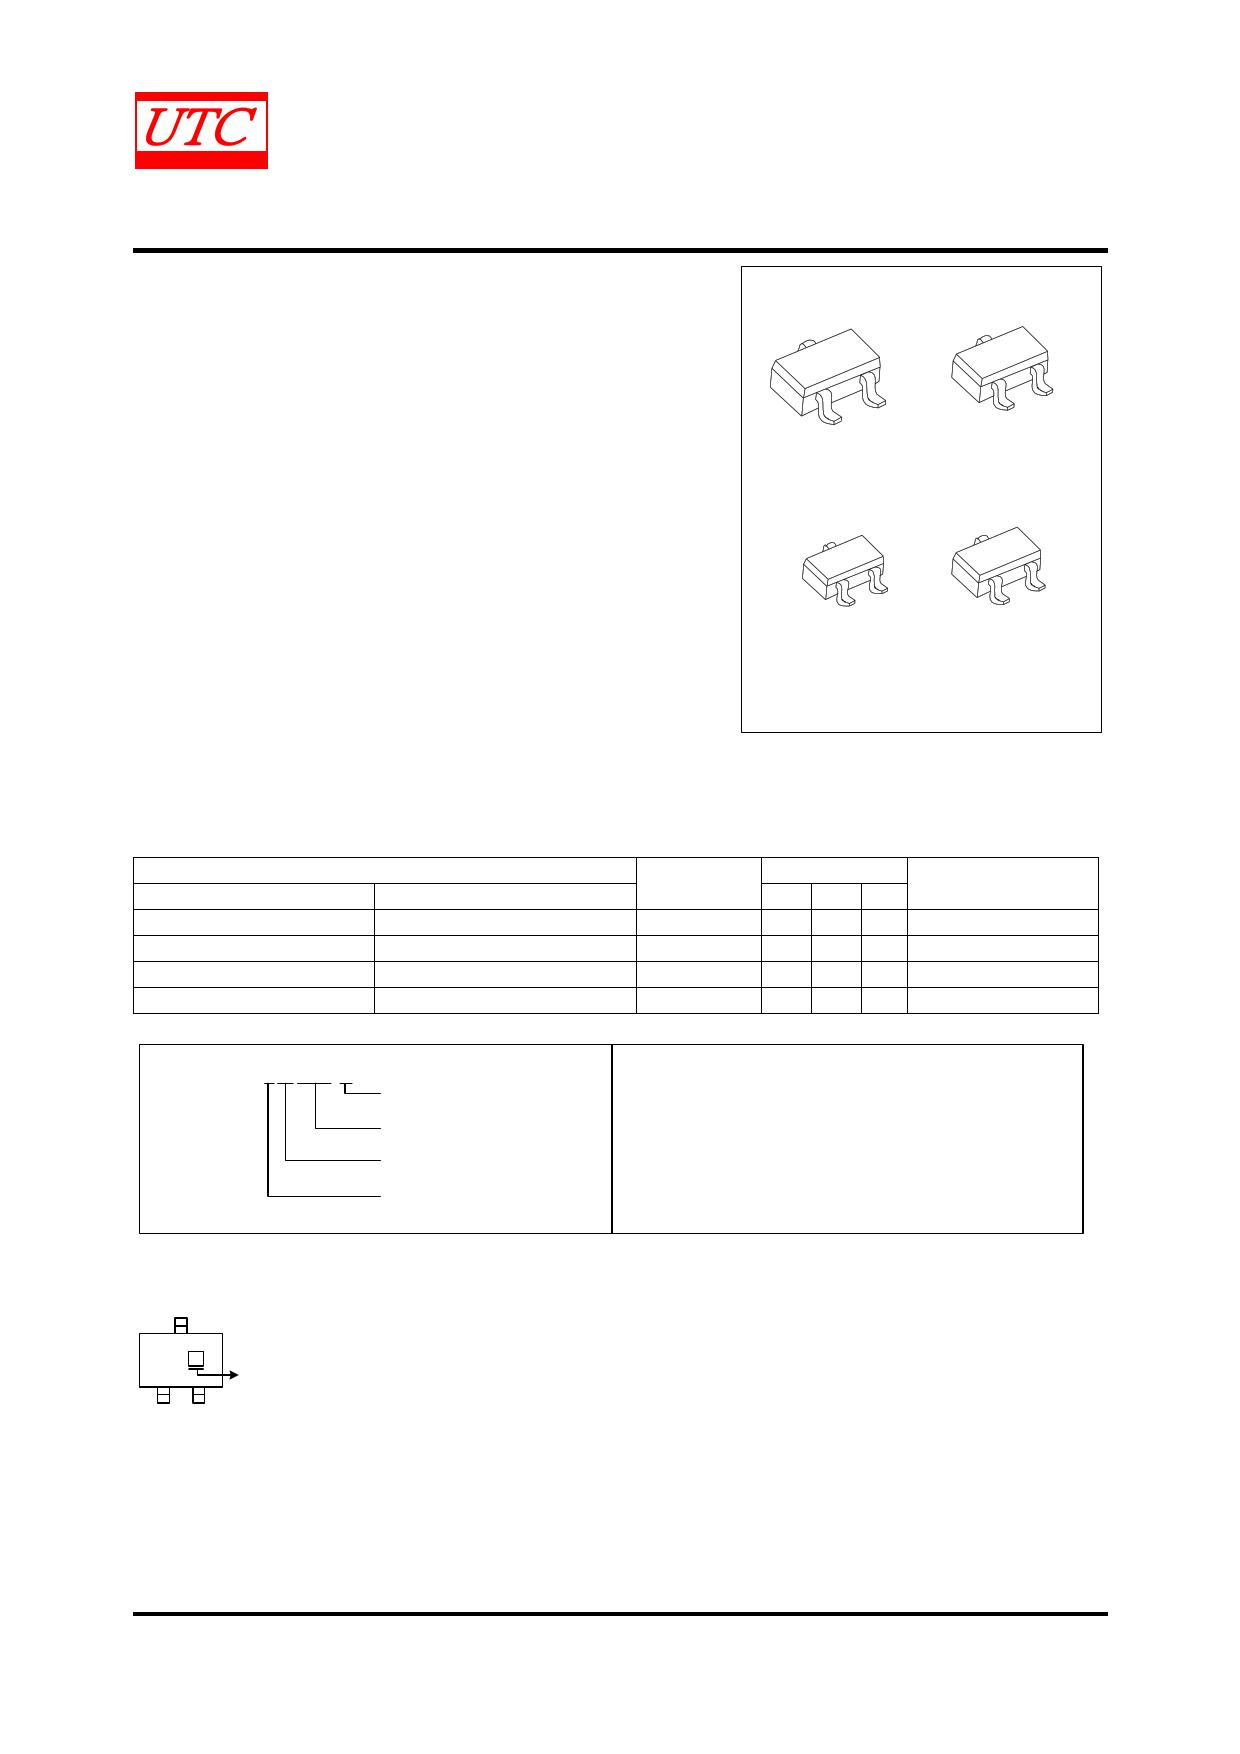 MMBT1015 Datasheet, MMBT1015 PDF,ピン配置, 機能